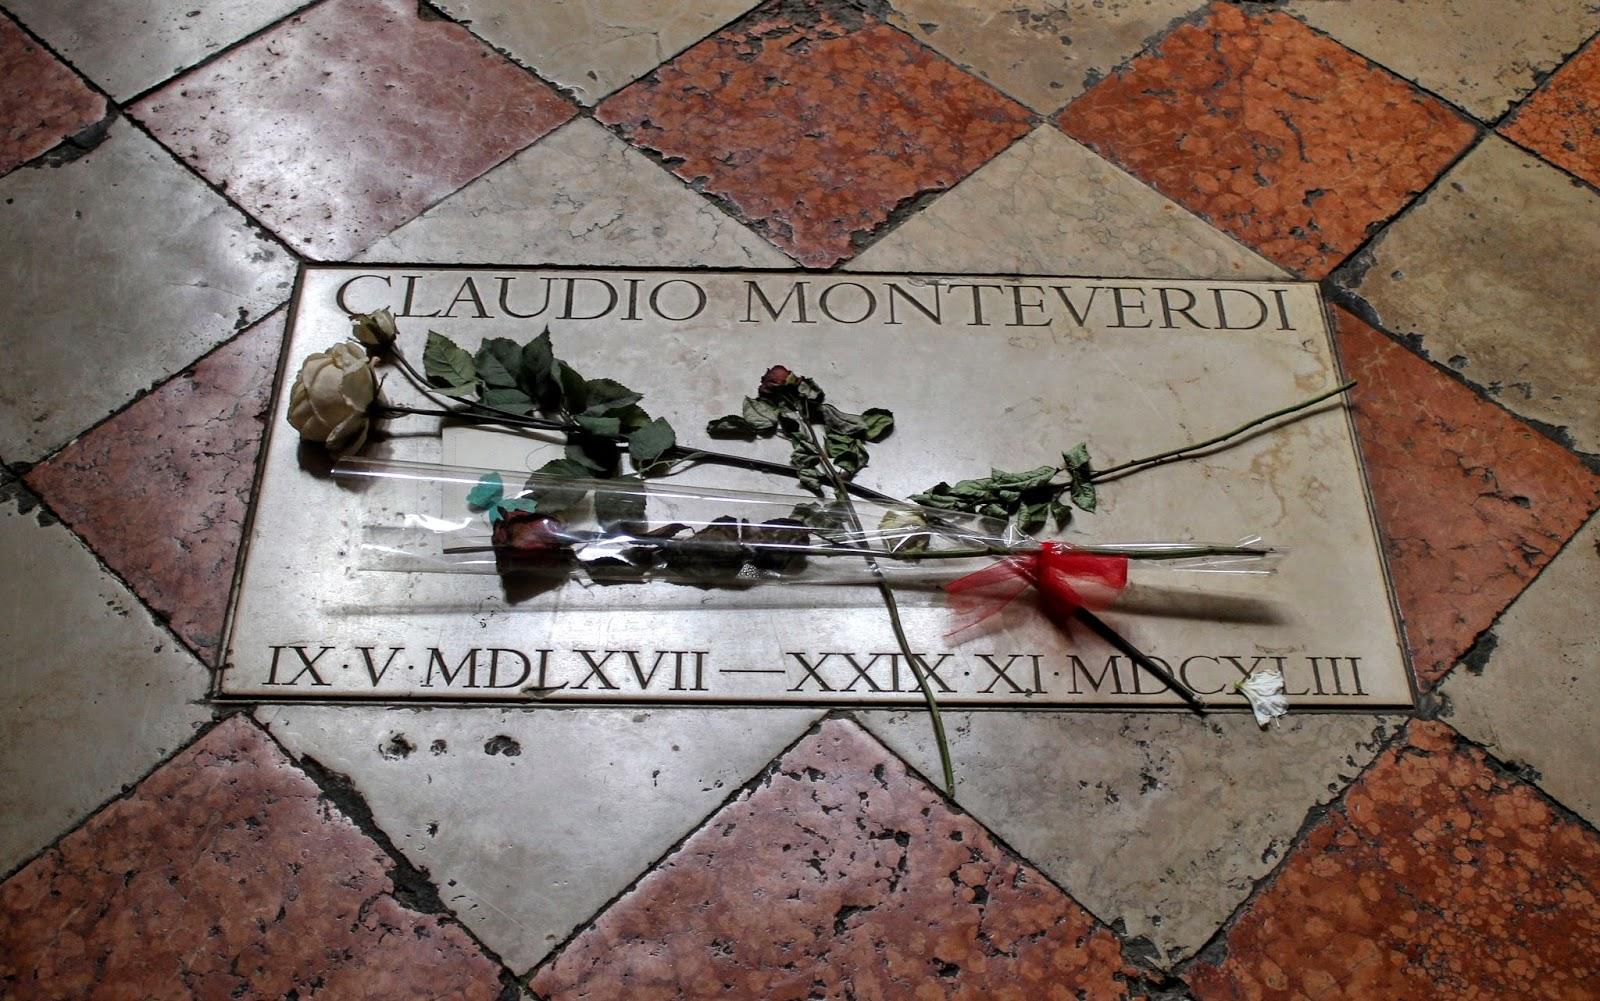 the life and work of claudio monteverdi